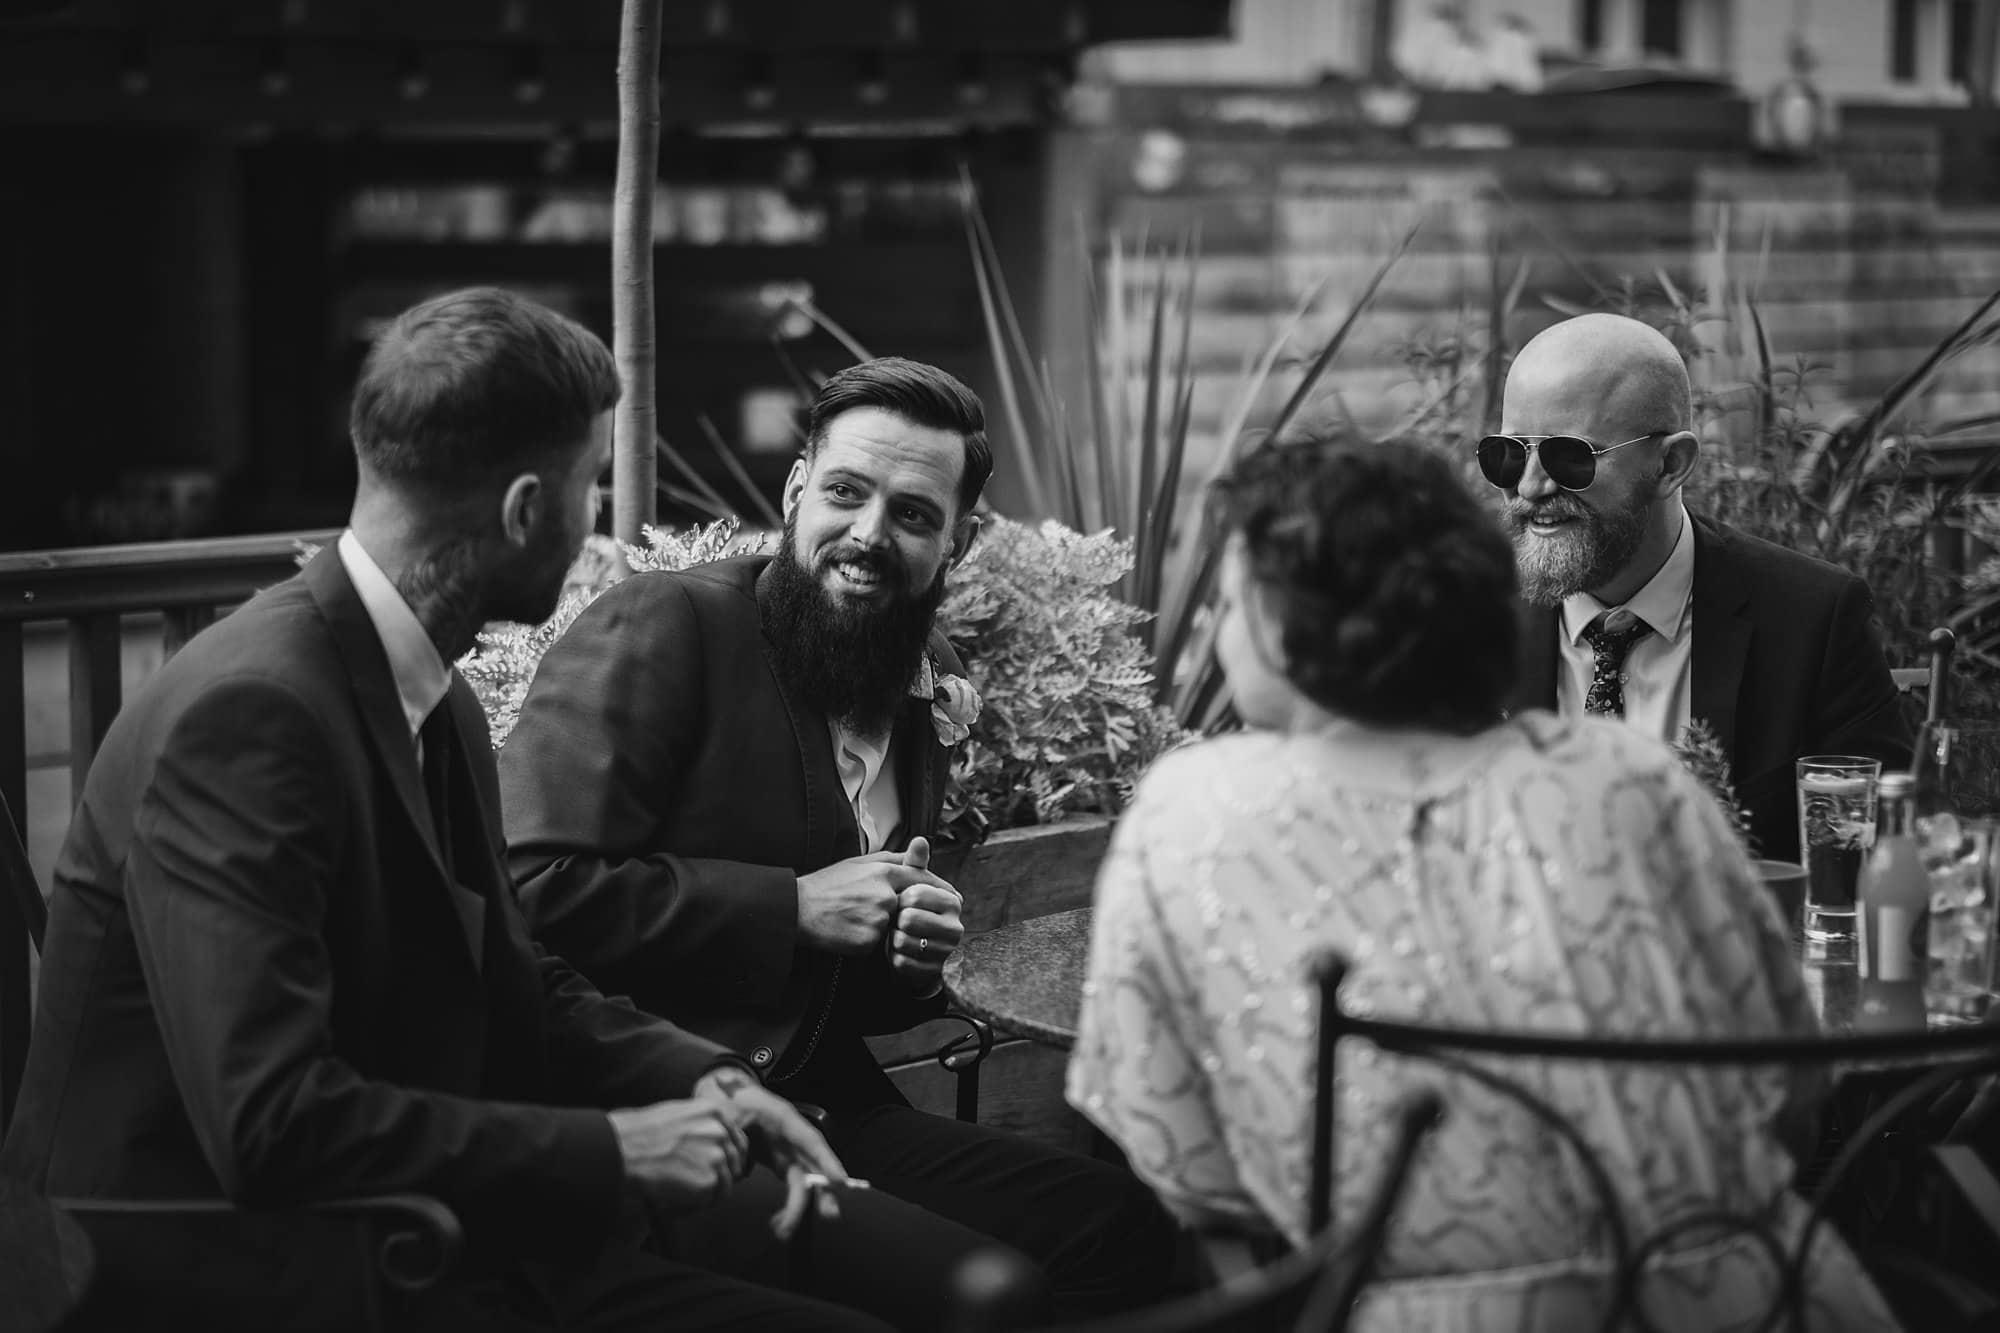 london pub wedding photographer jn 055 - The County Arms Wedding Photographer   Jen & Nick